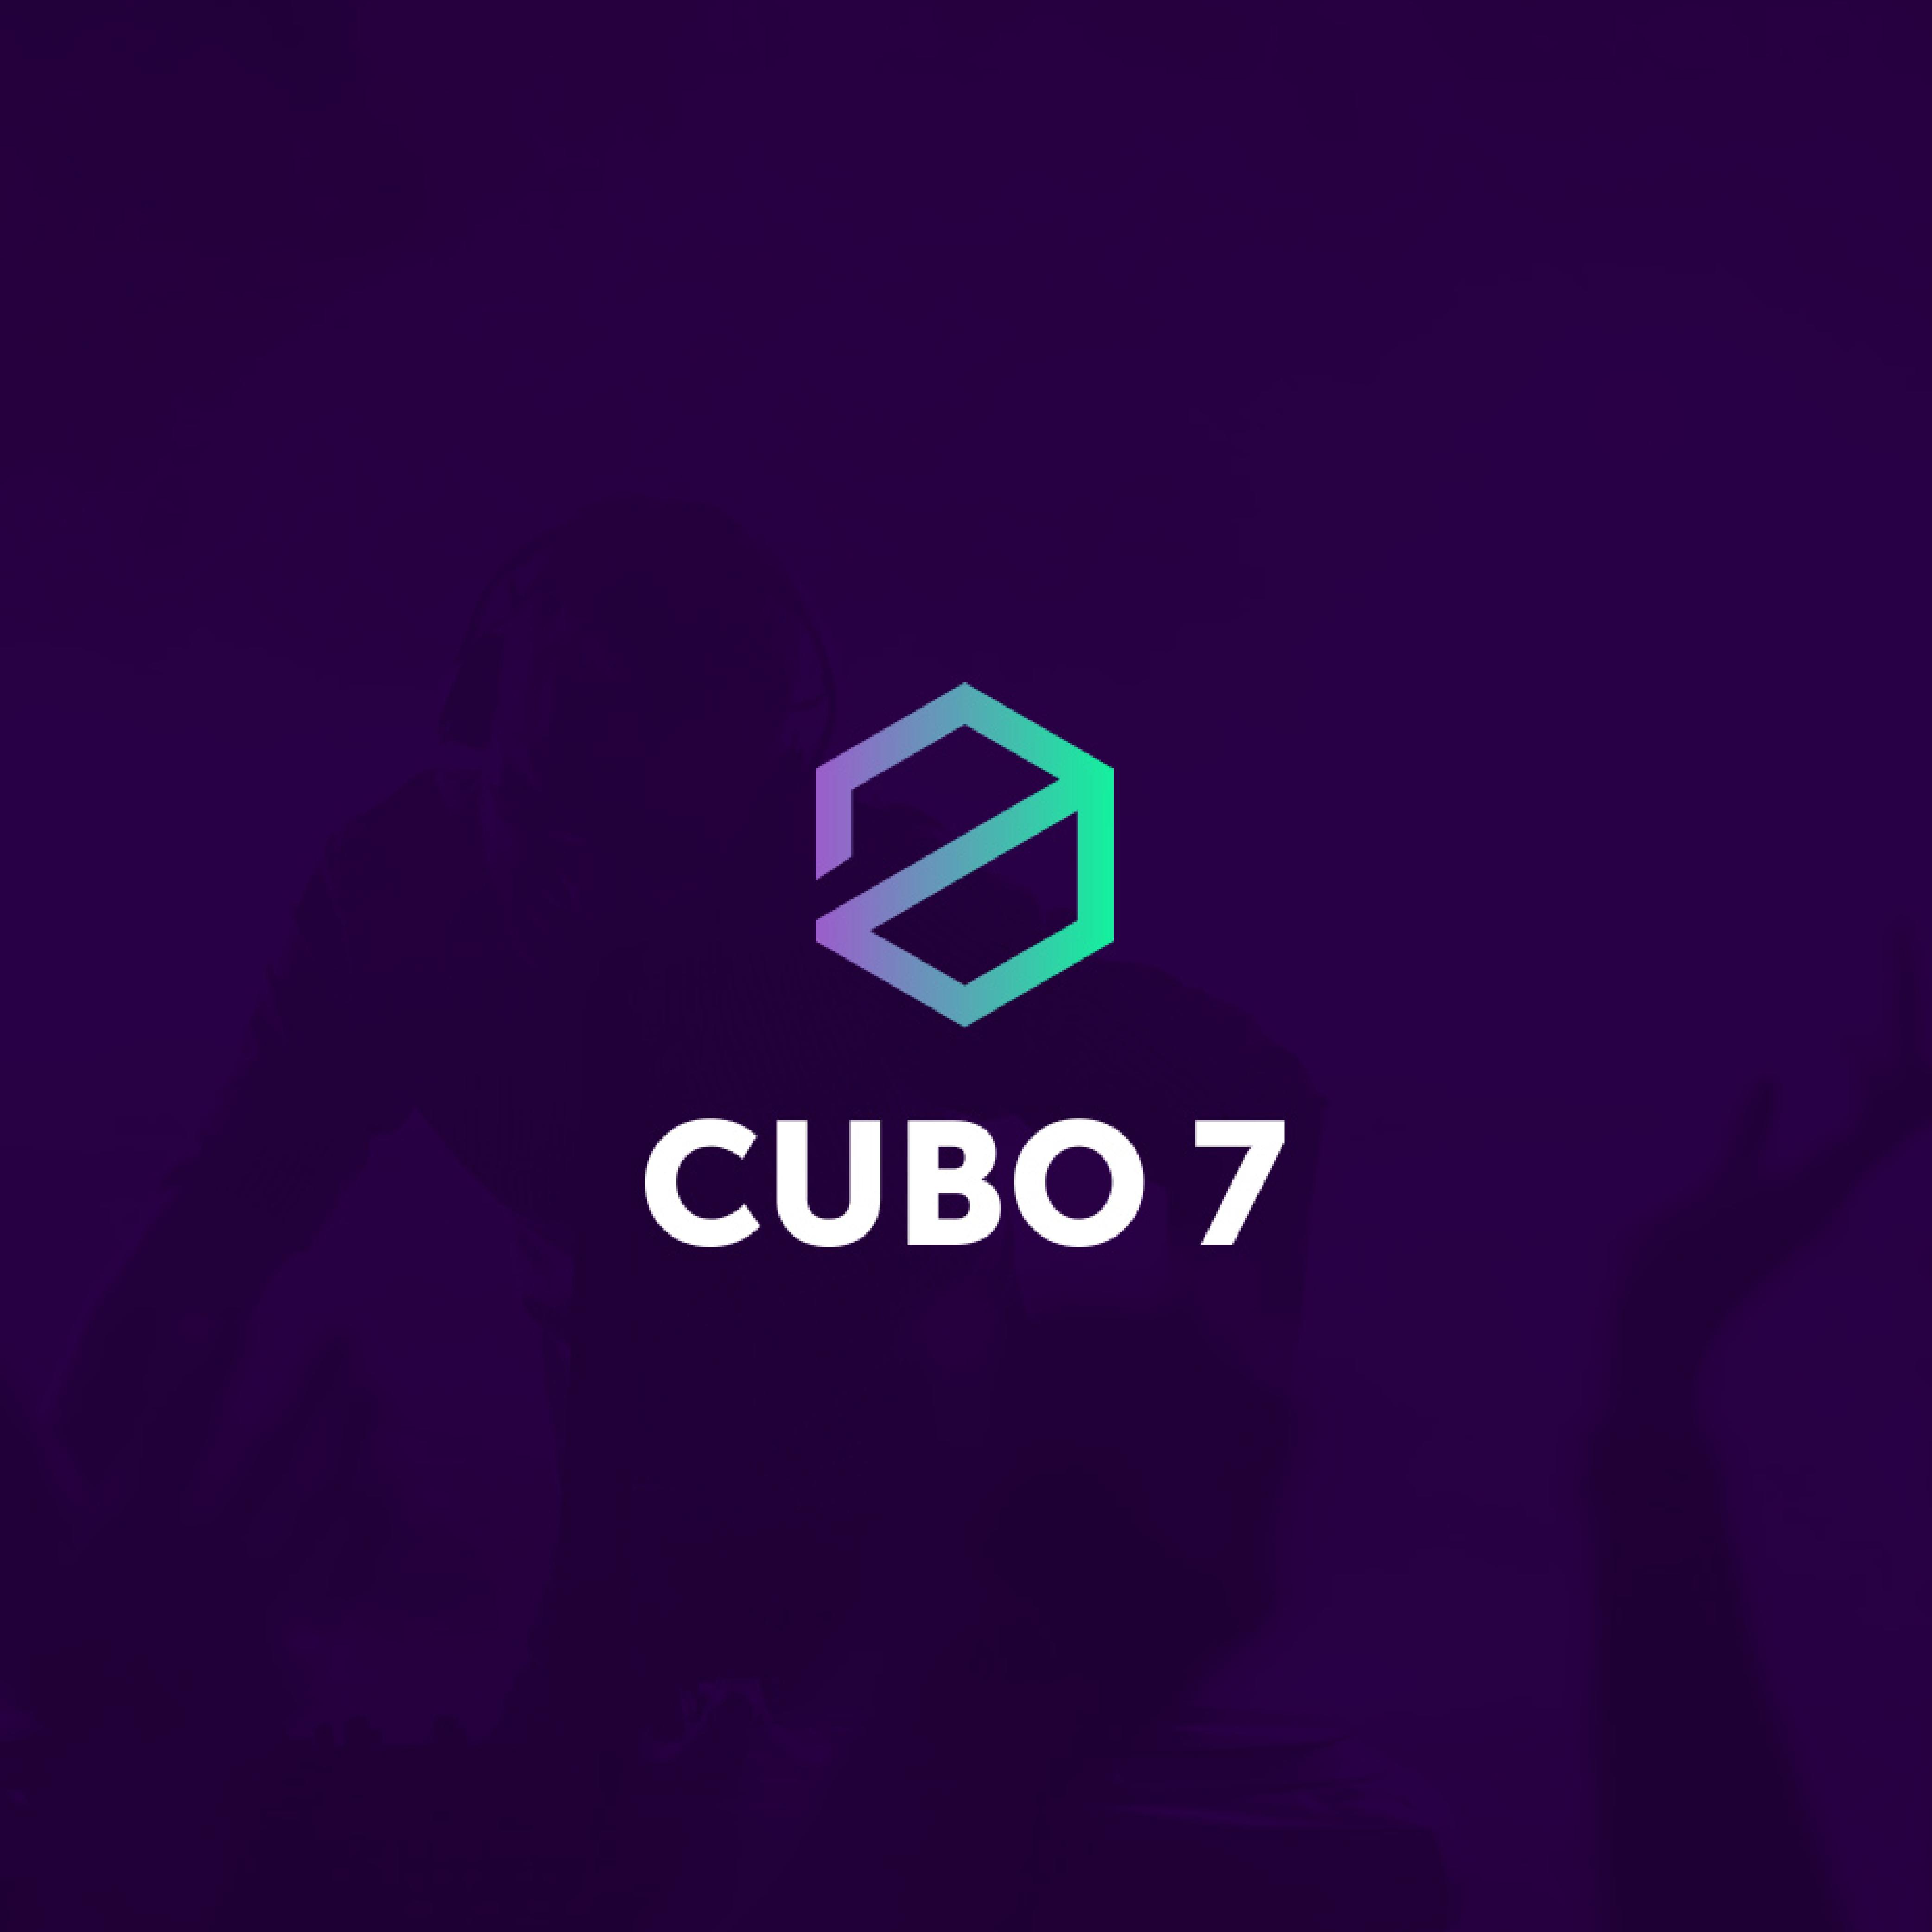 CUBO RESPONSIVE 02 - Cubo 7